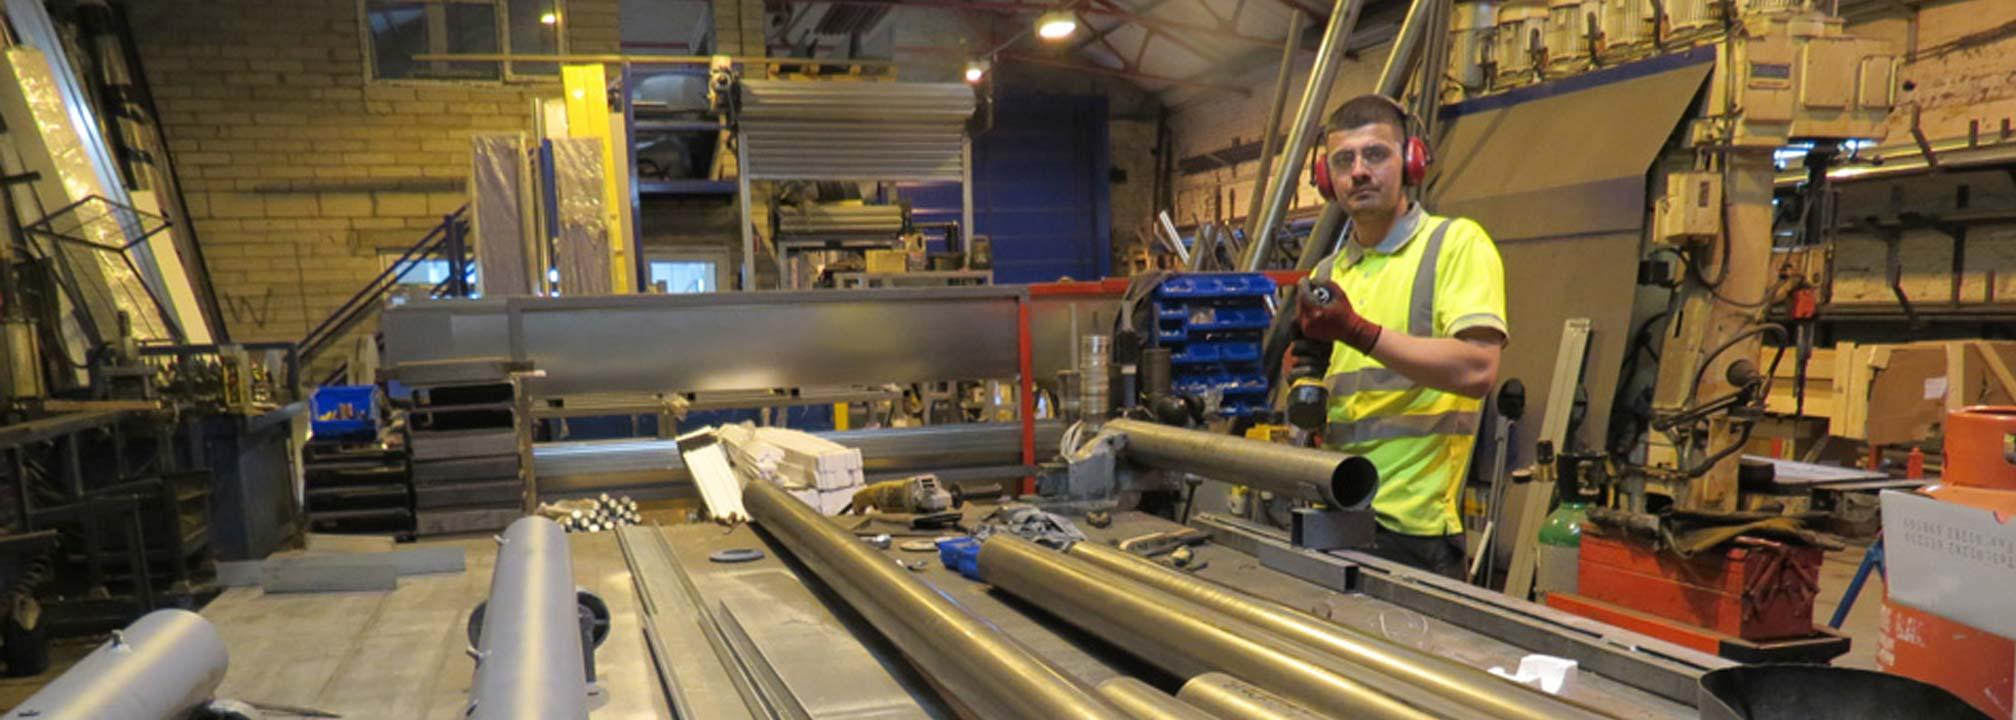 Roller Shutter Welder/Fabricator